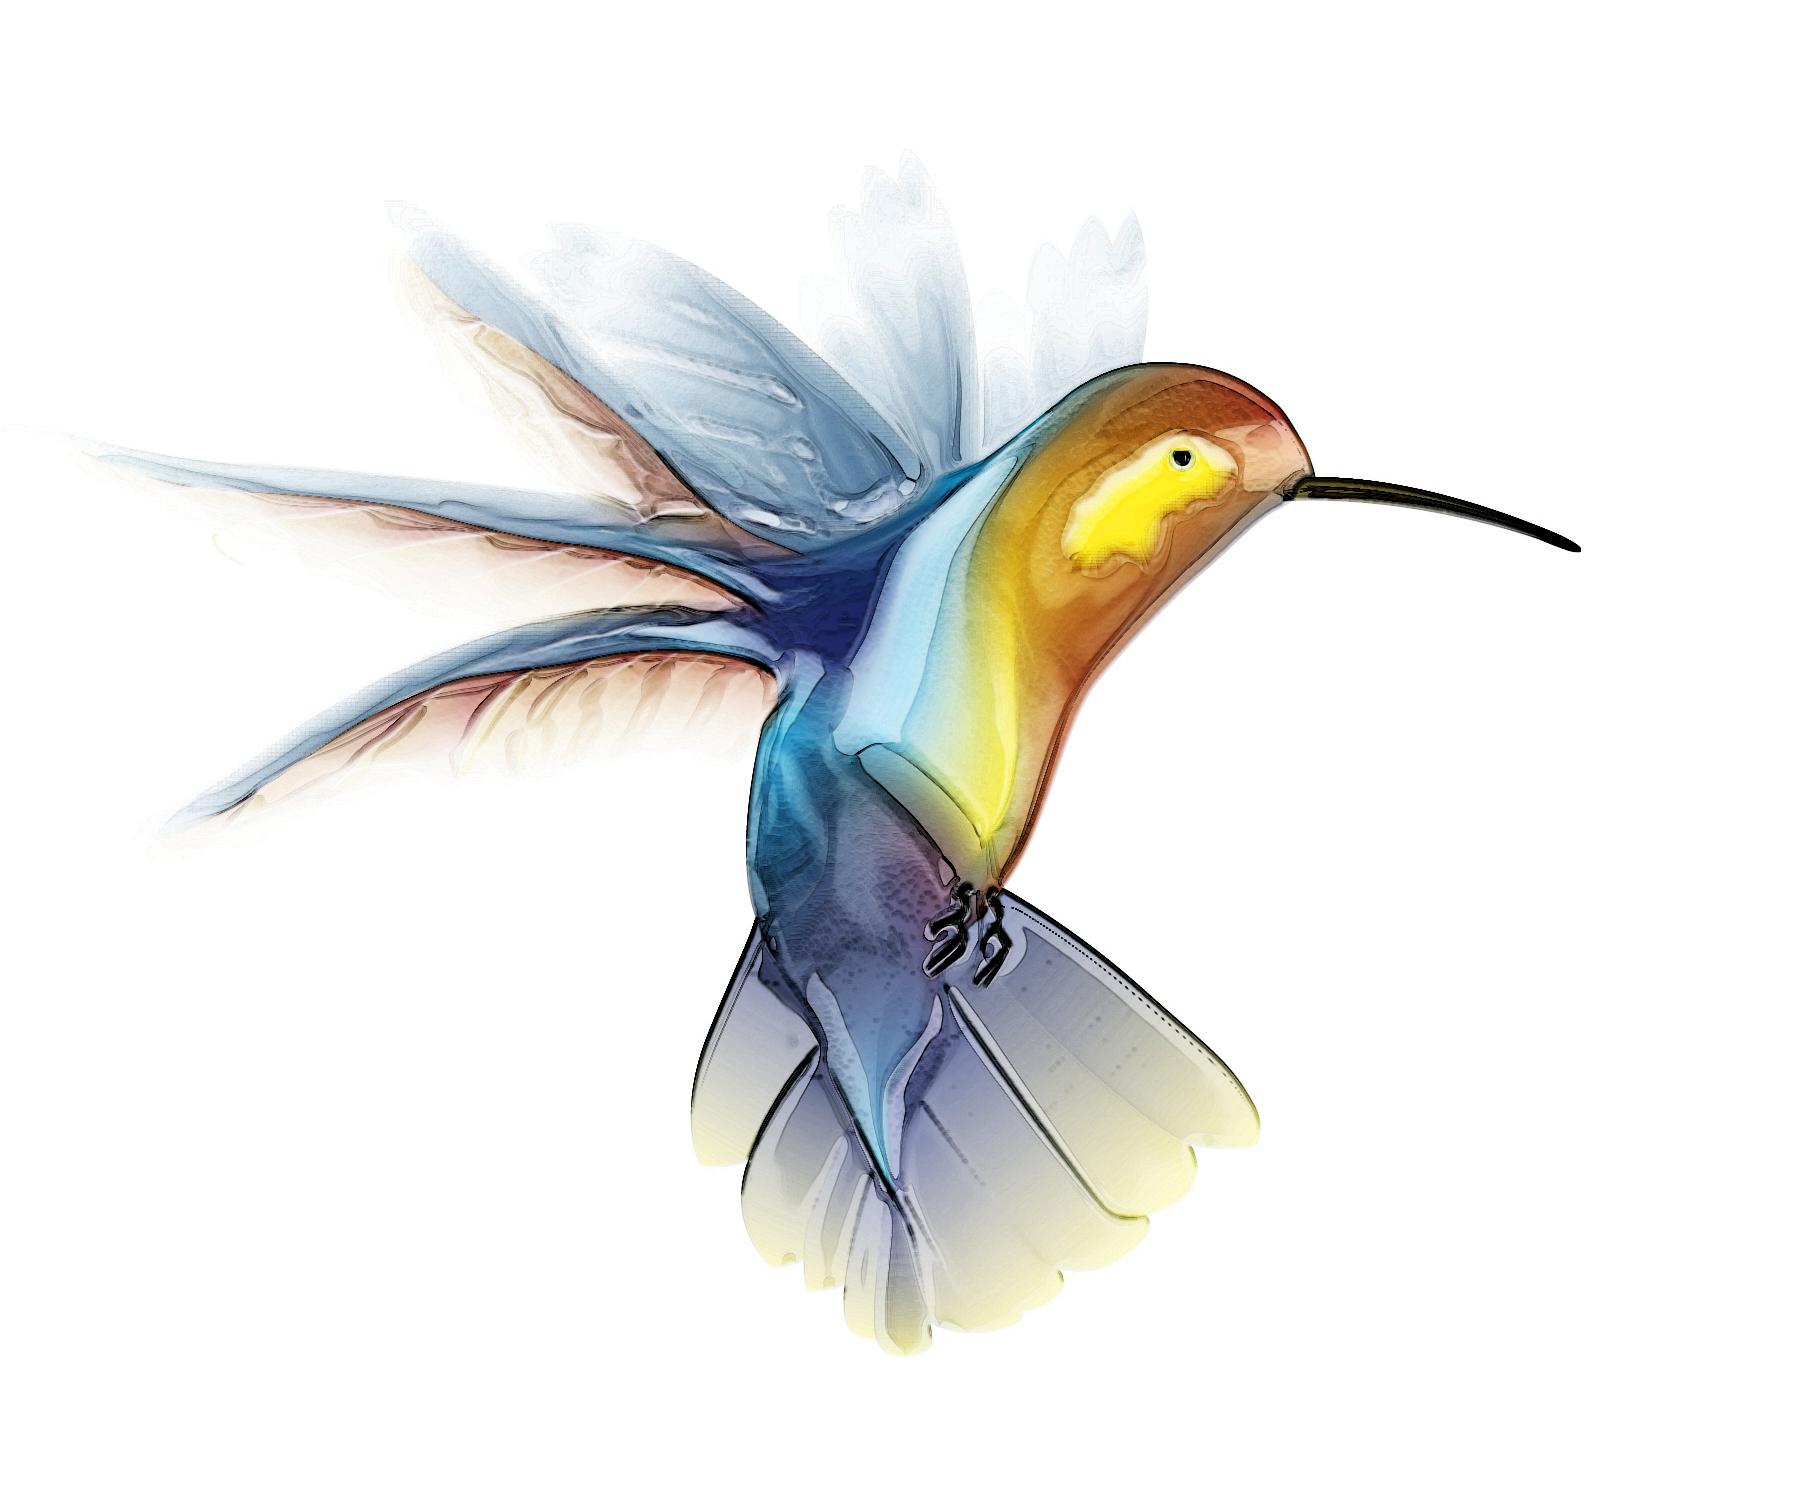 Hummingbird Image